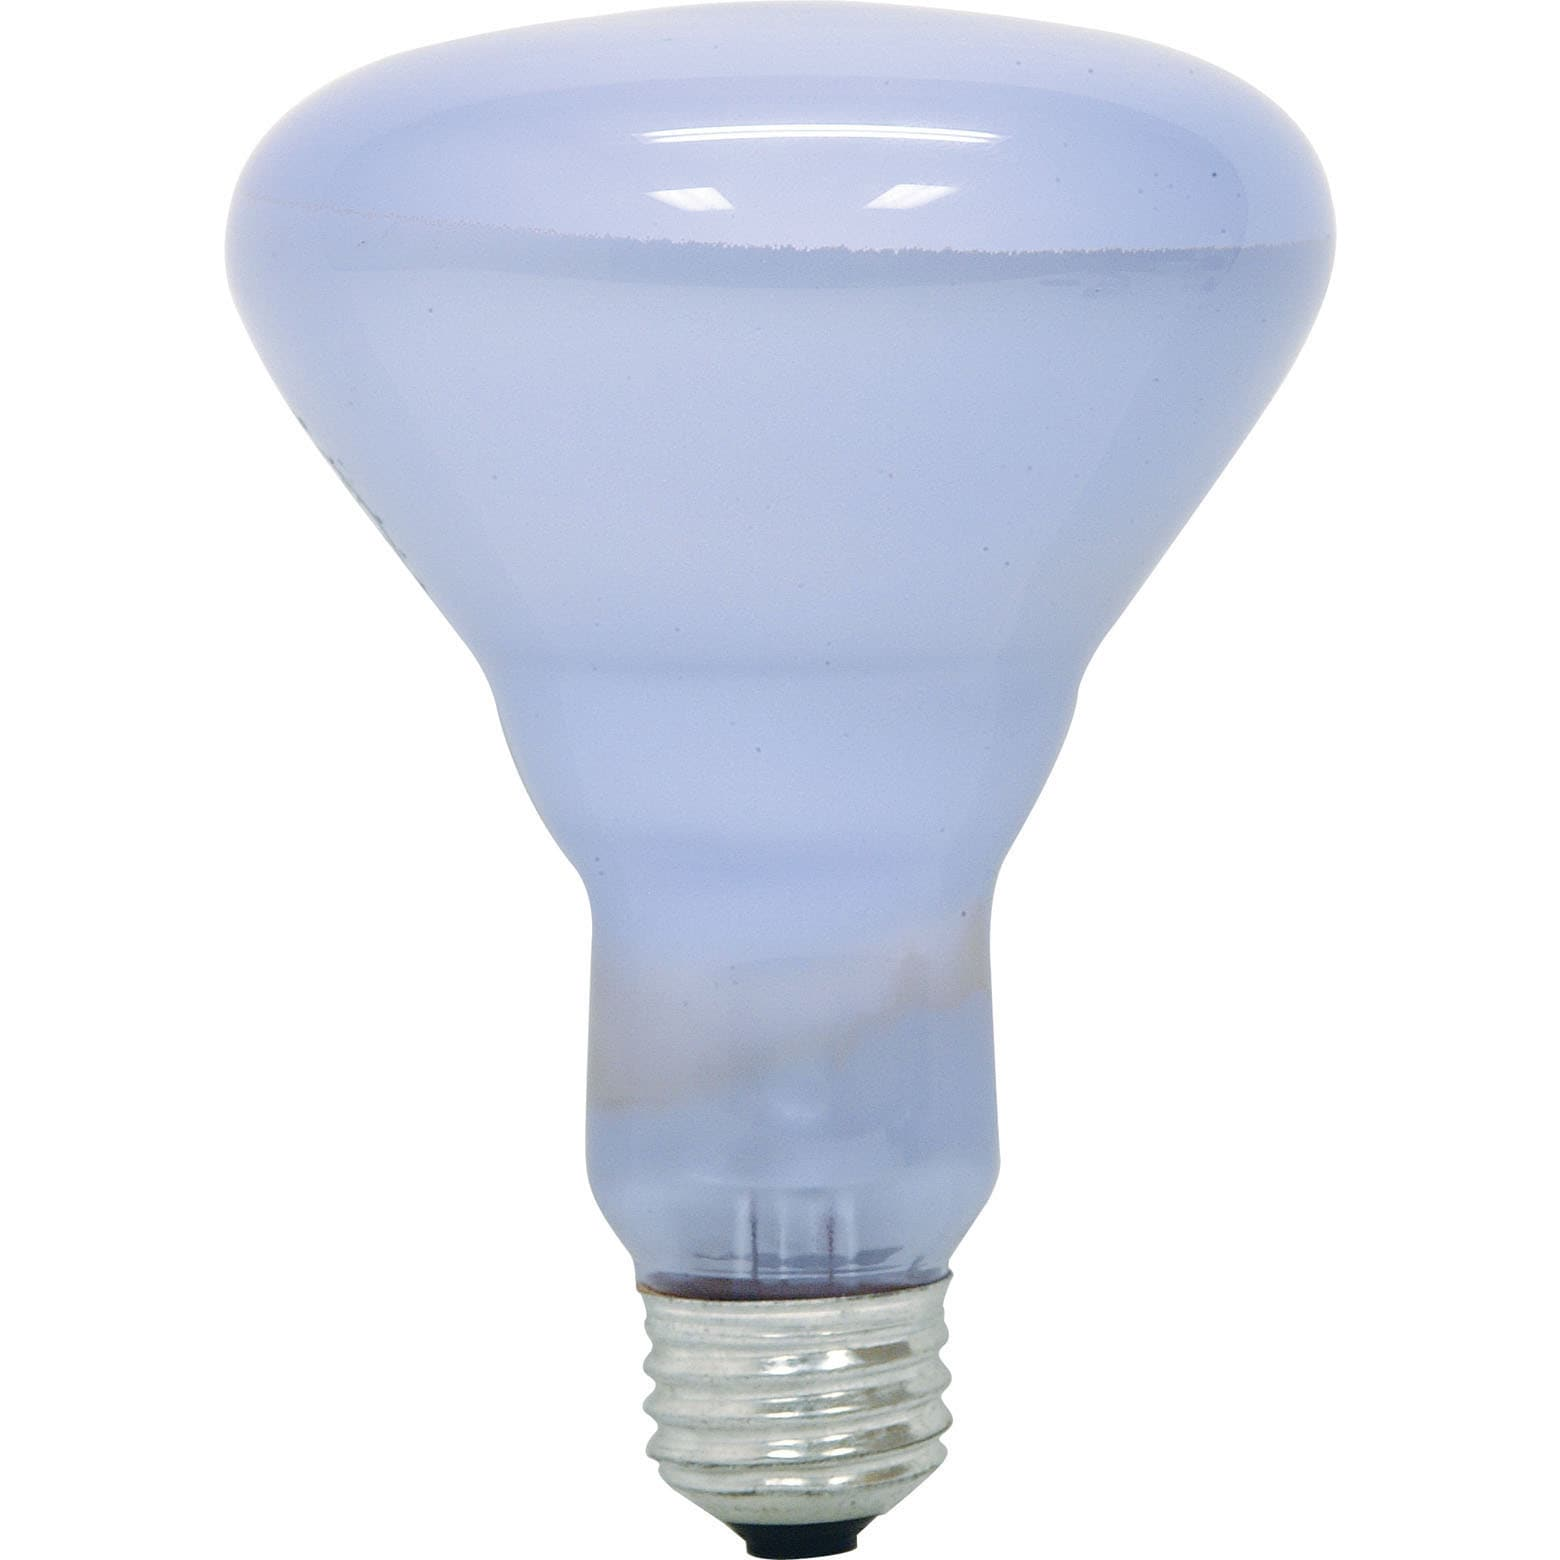 GE Lighting 14878 45 Watt Soft White Indoor Spotlight Bul...